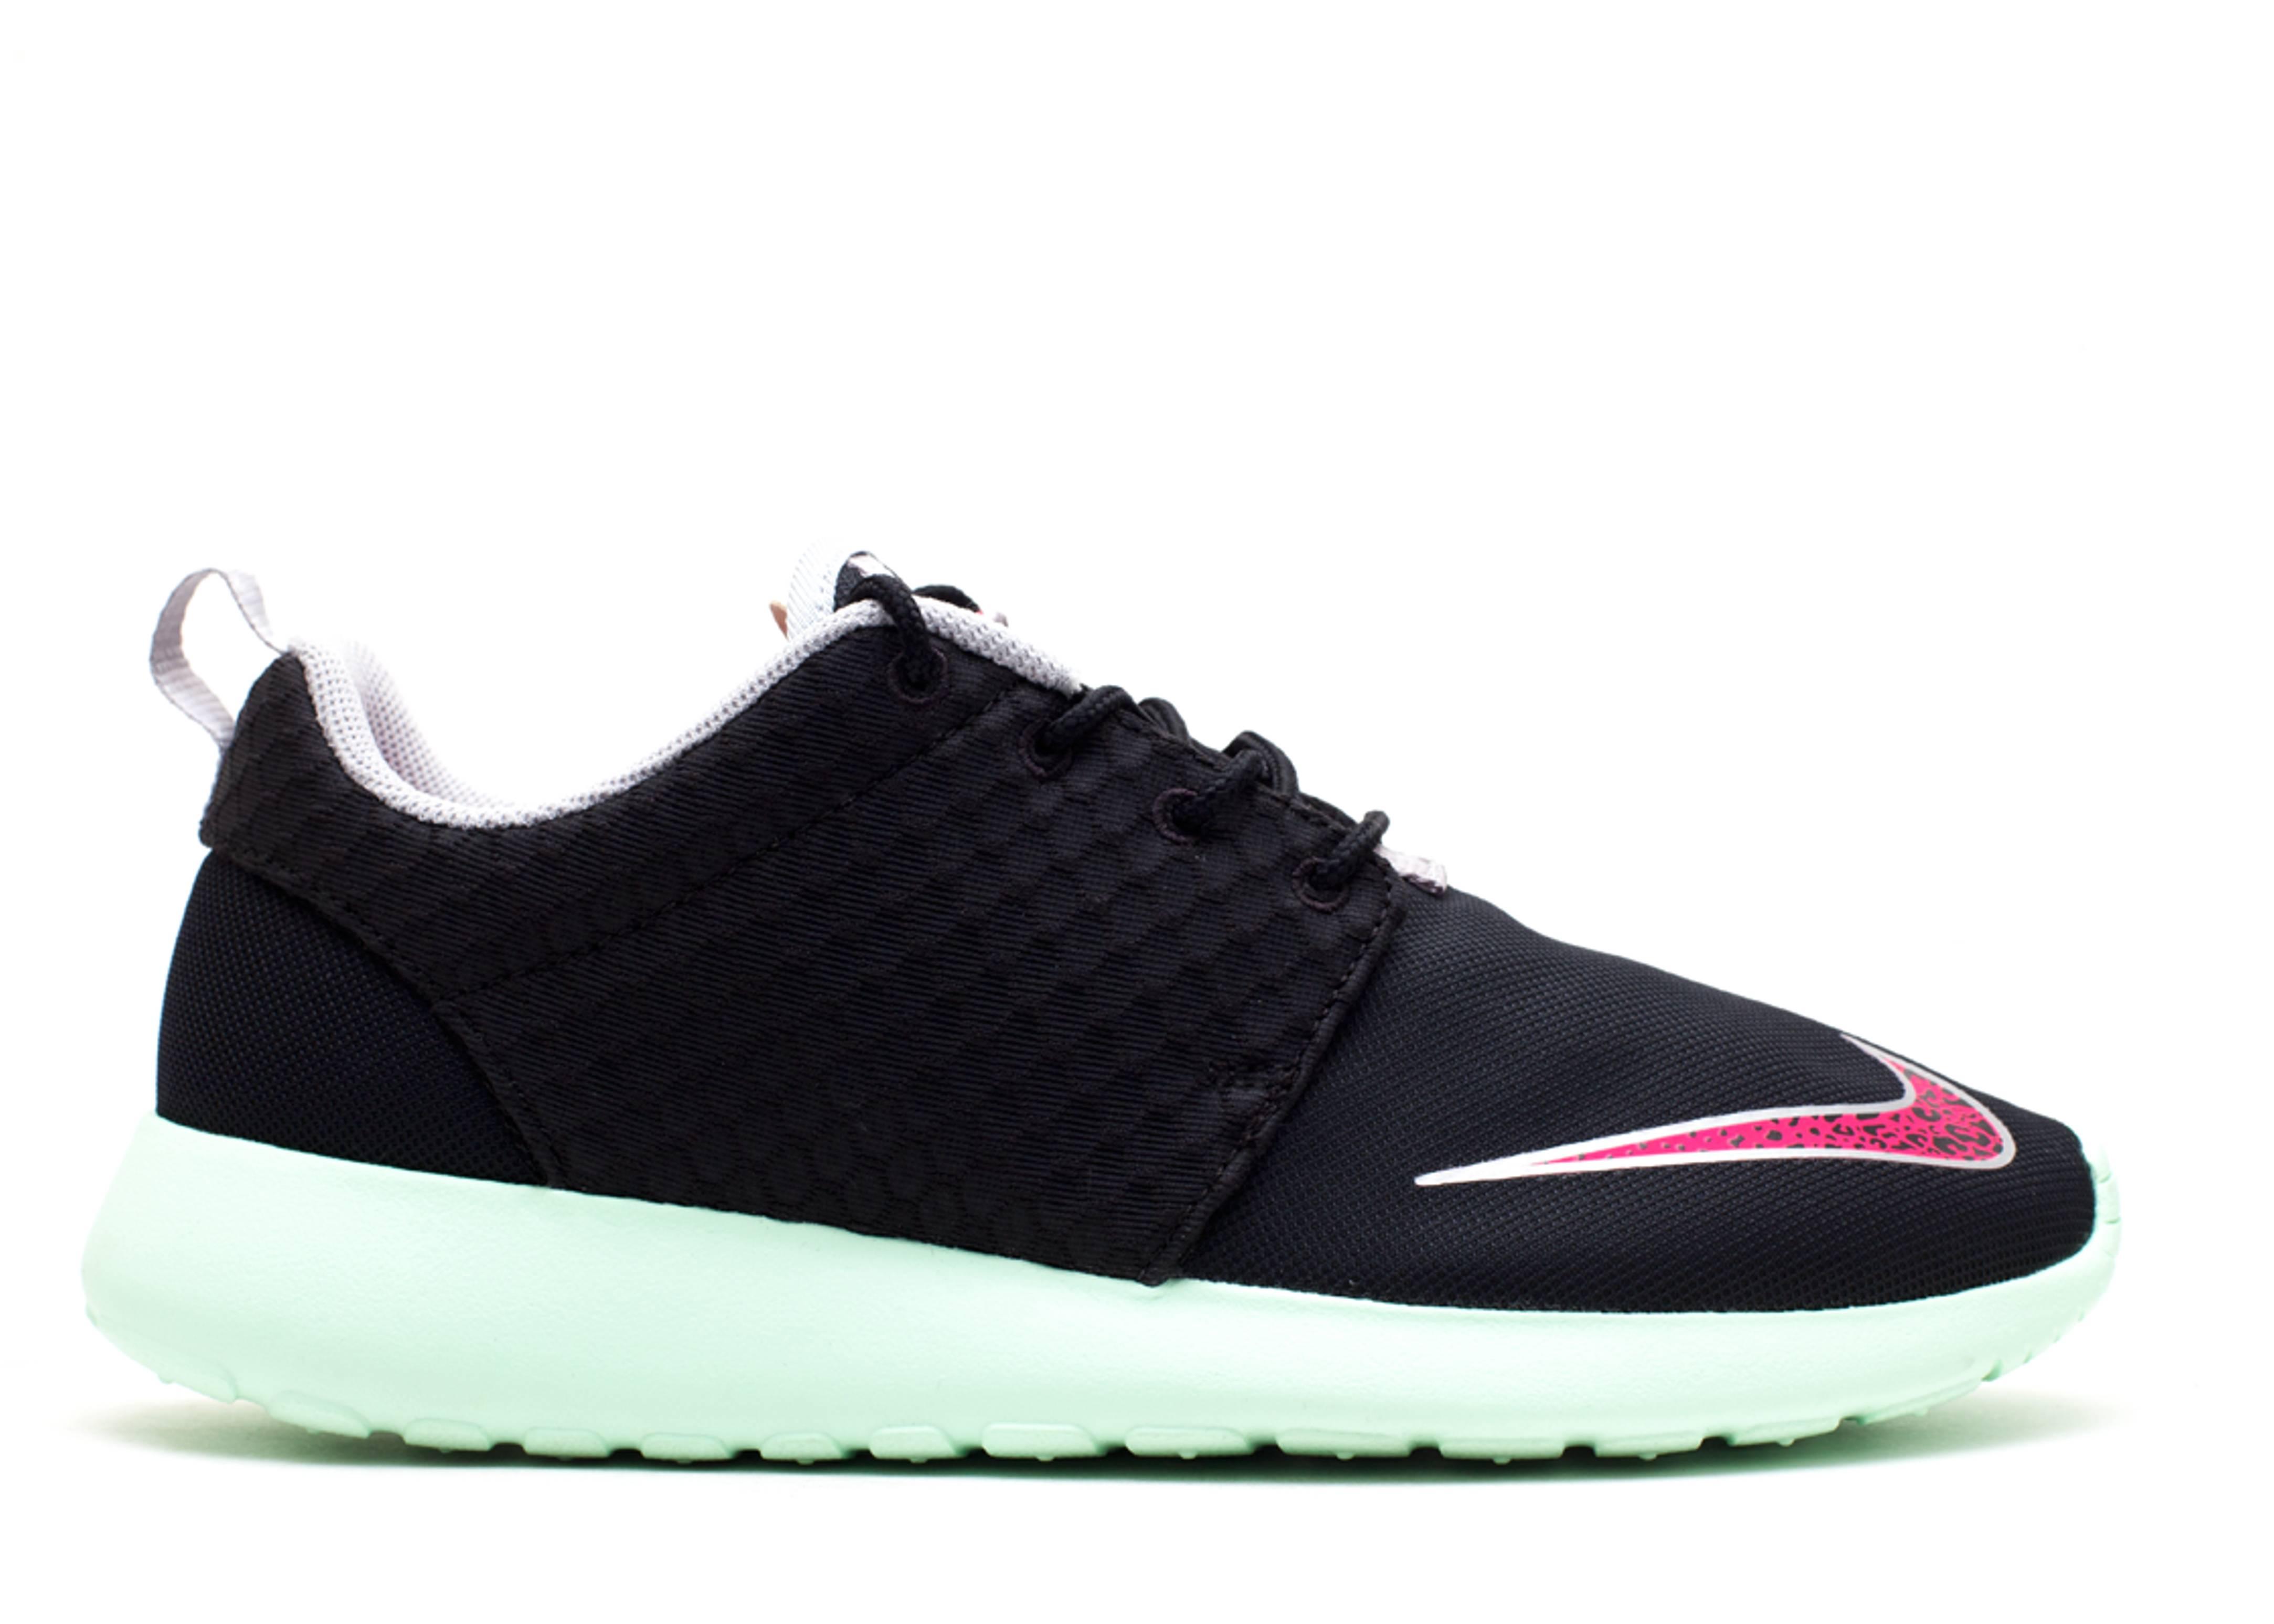 explosión Sumergir harto  Roshe One FB 'Yeezy' - Nike - 580573 063 - black/pink flash-frsh mnt-chrm |  Flight Club